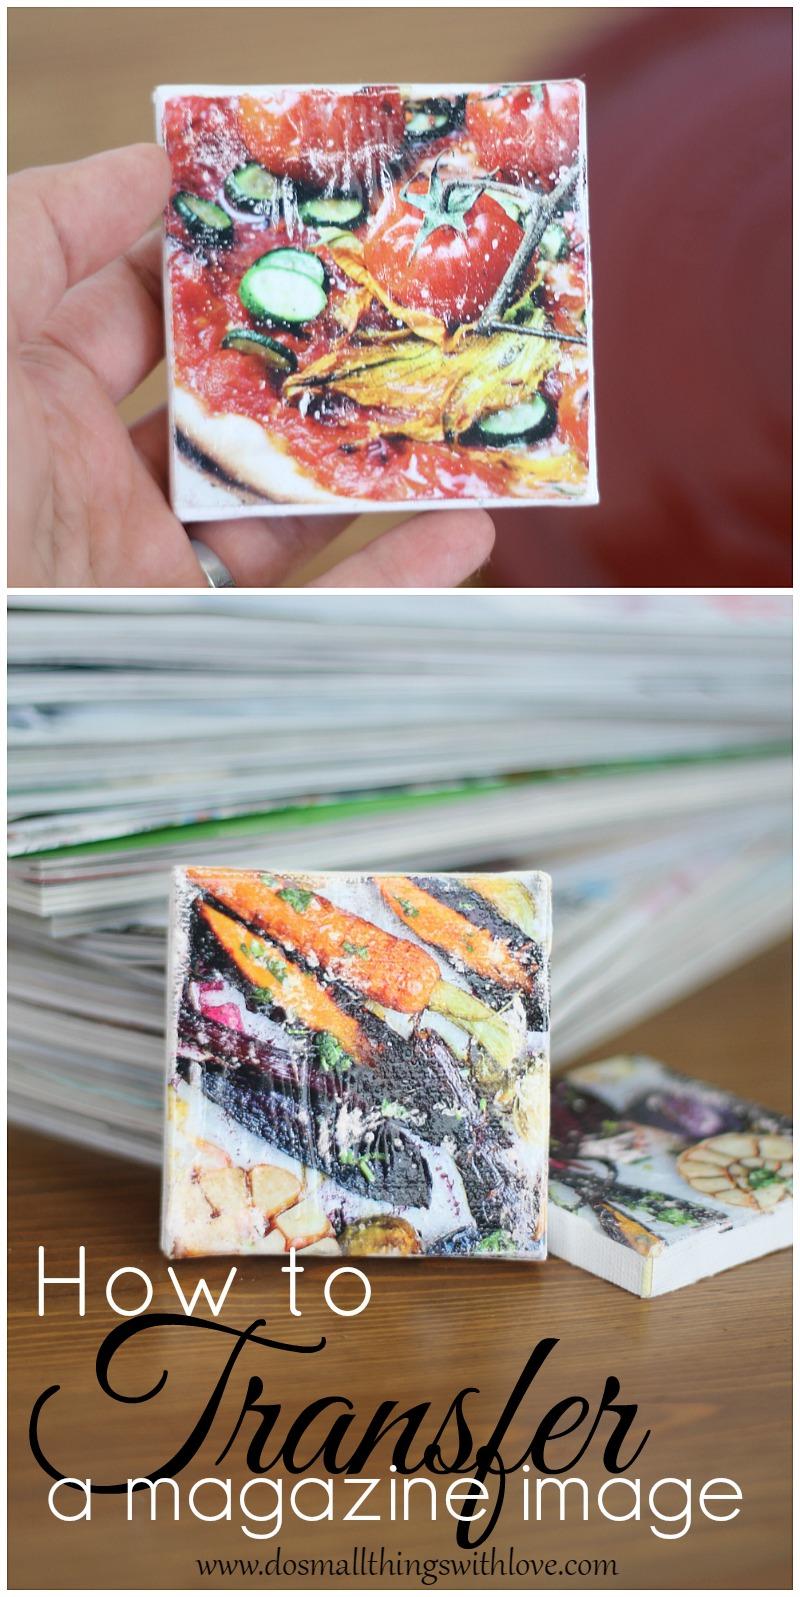 how to transfer a magazine image